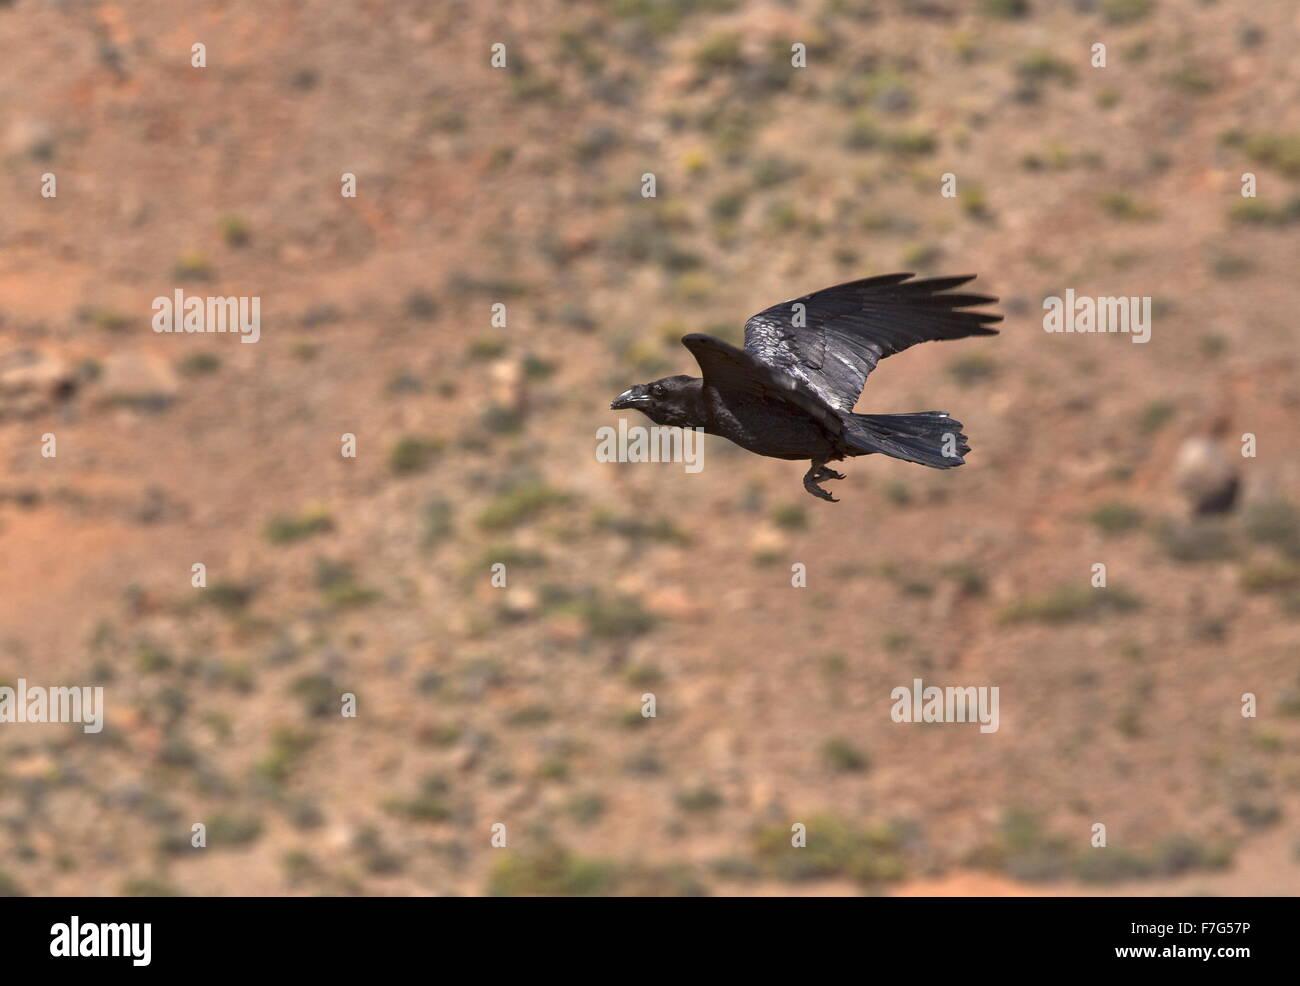 Canaries/North African subspecies of Raven, Corvus corax tingitanus, in flight; Fuerteventura - Stock Image